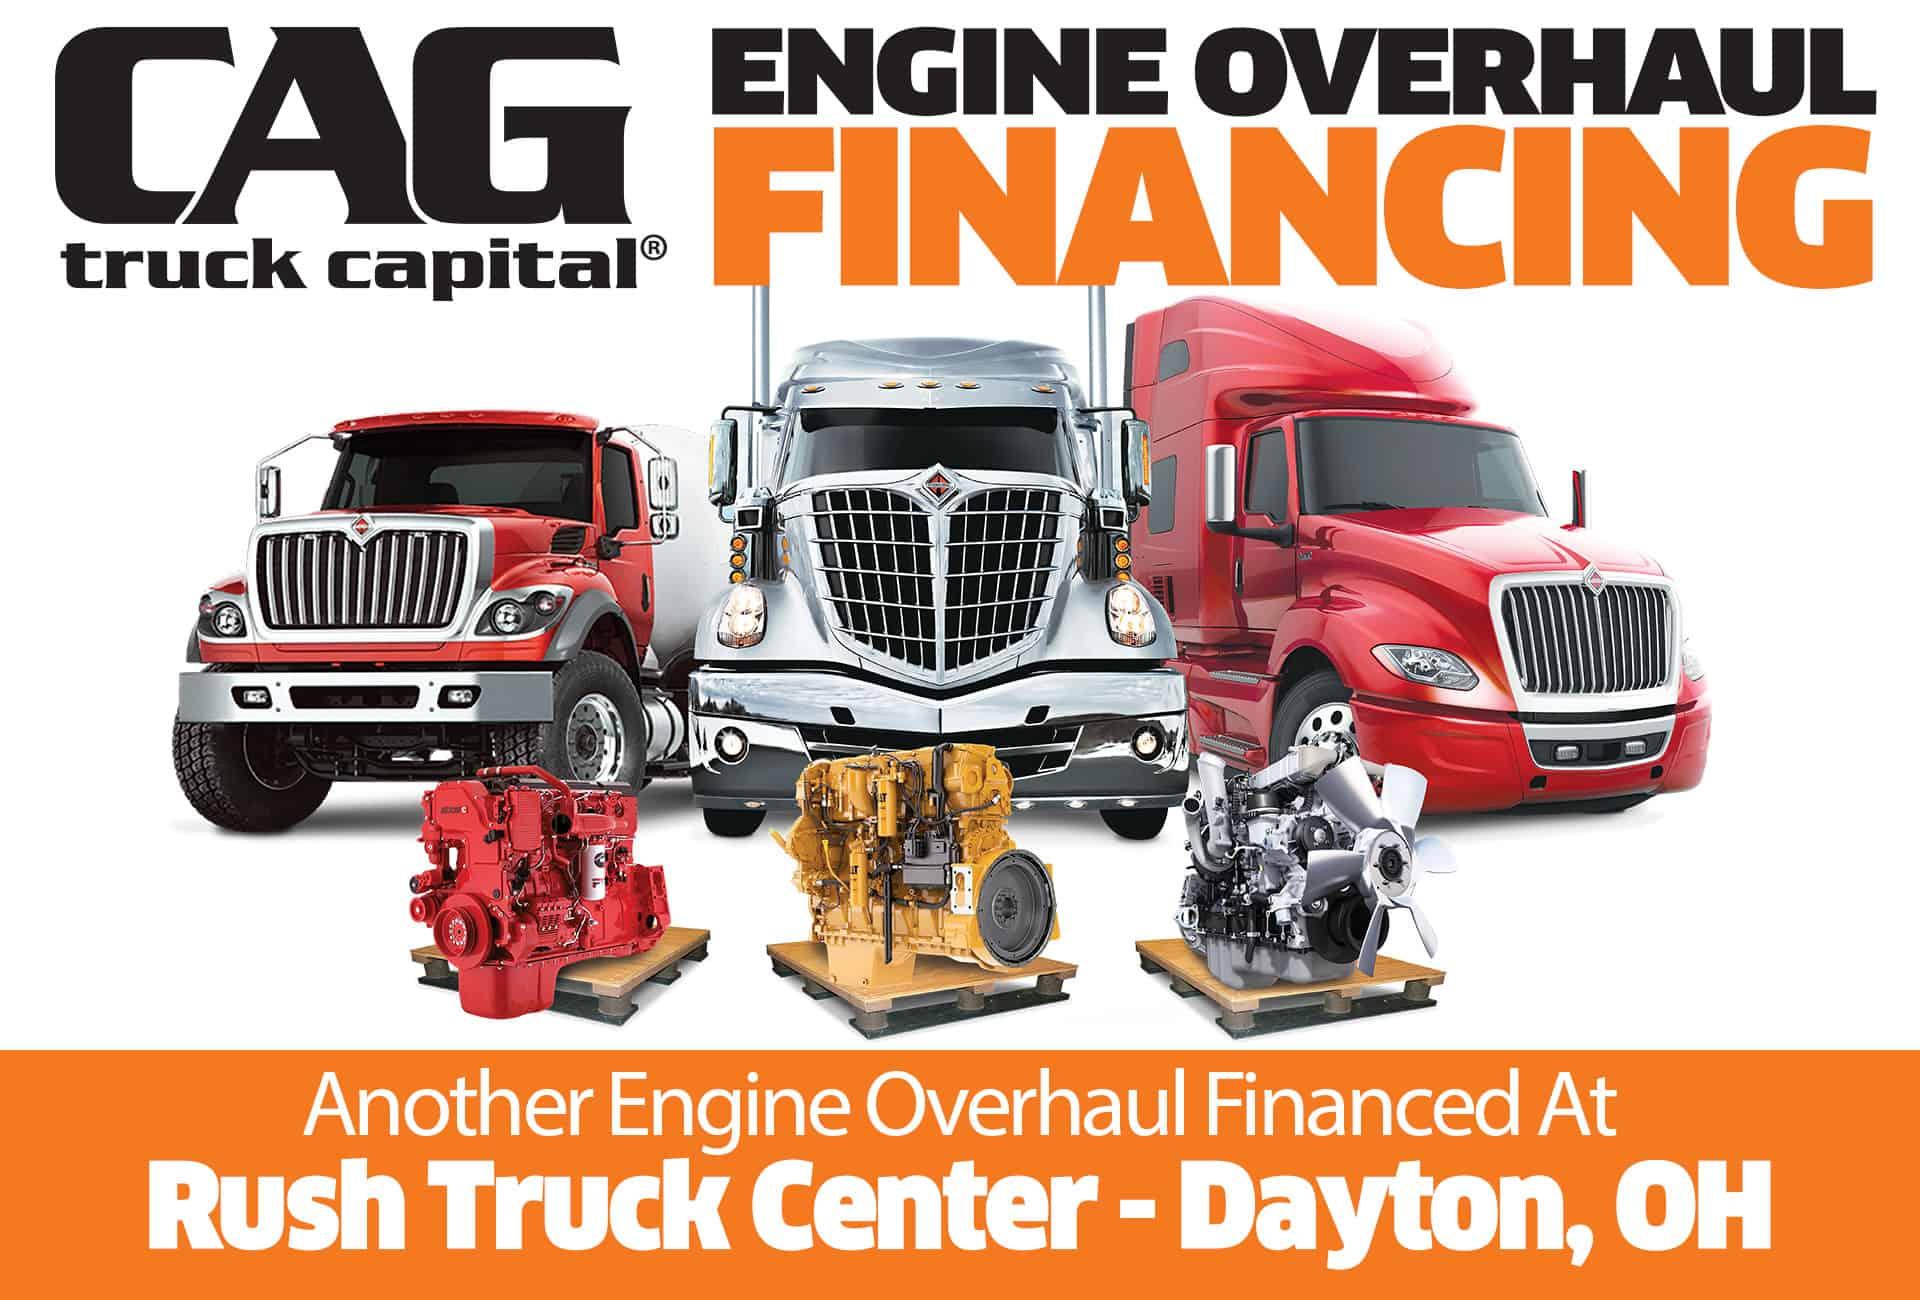 Rush Truck Center Dayton OH